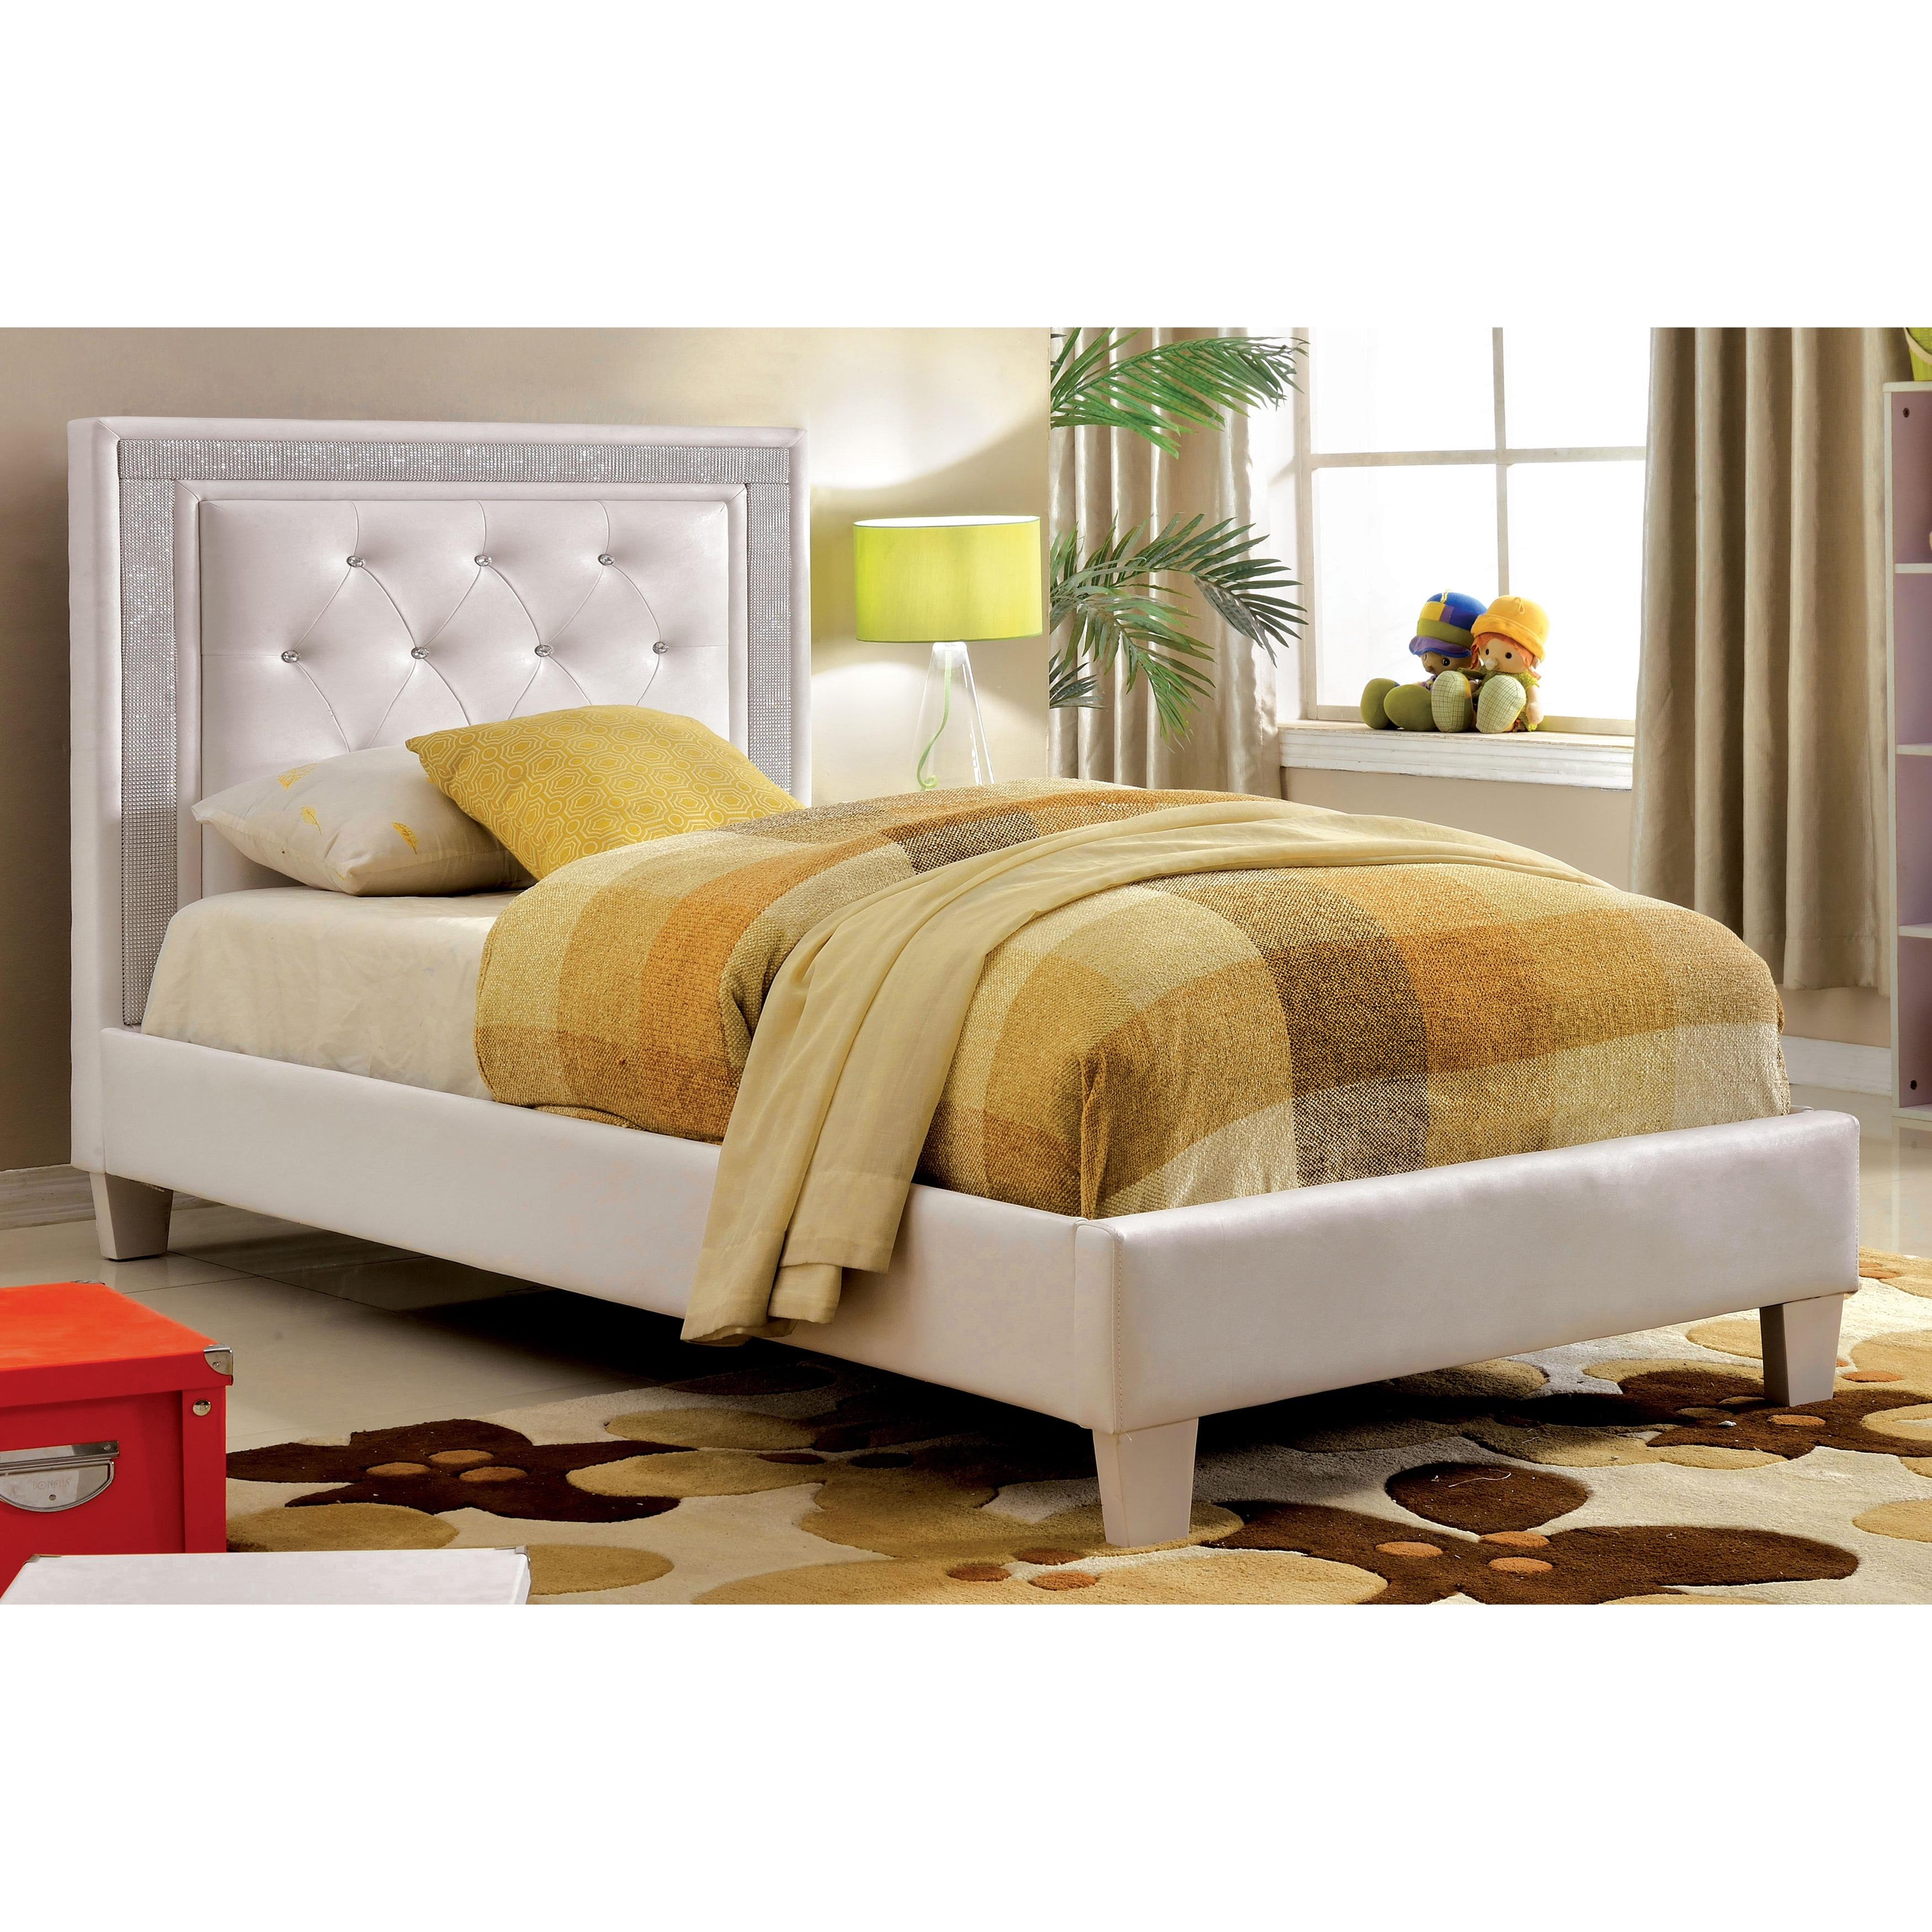 Furniture of America Sheila Contemporary Tufted White Lea...